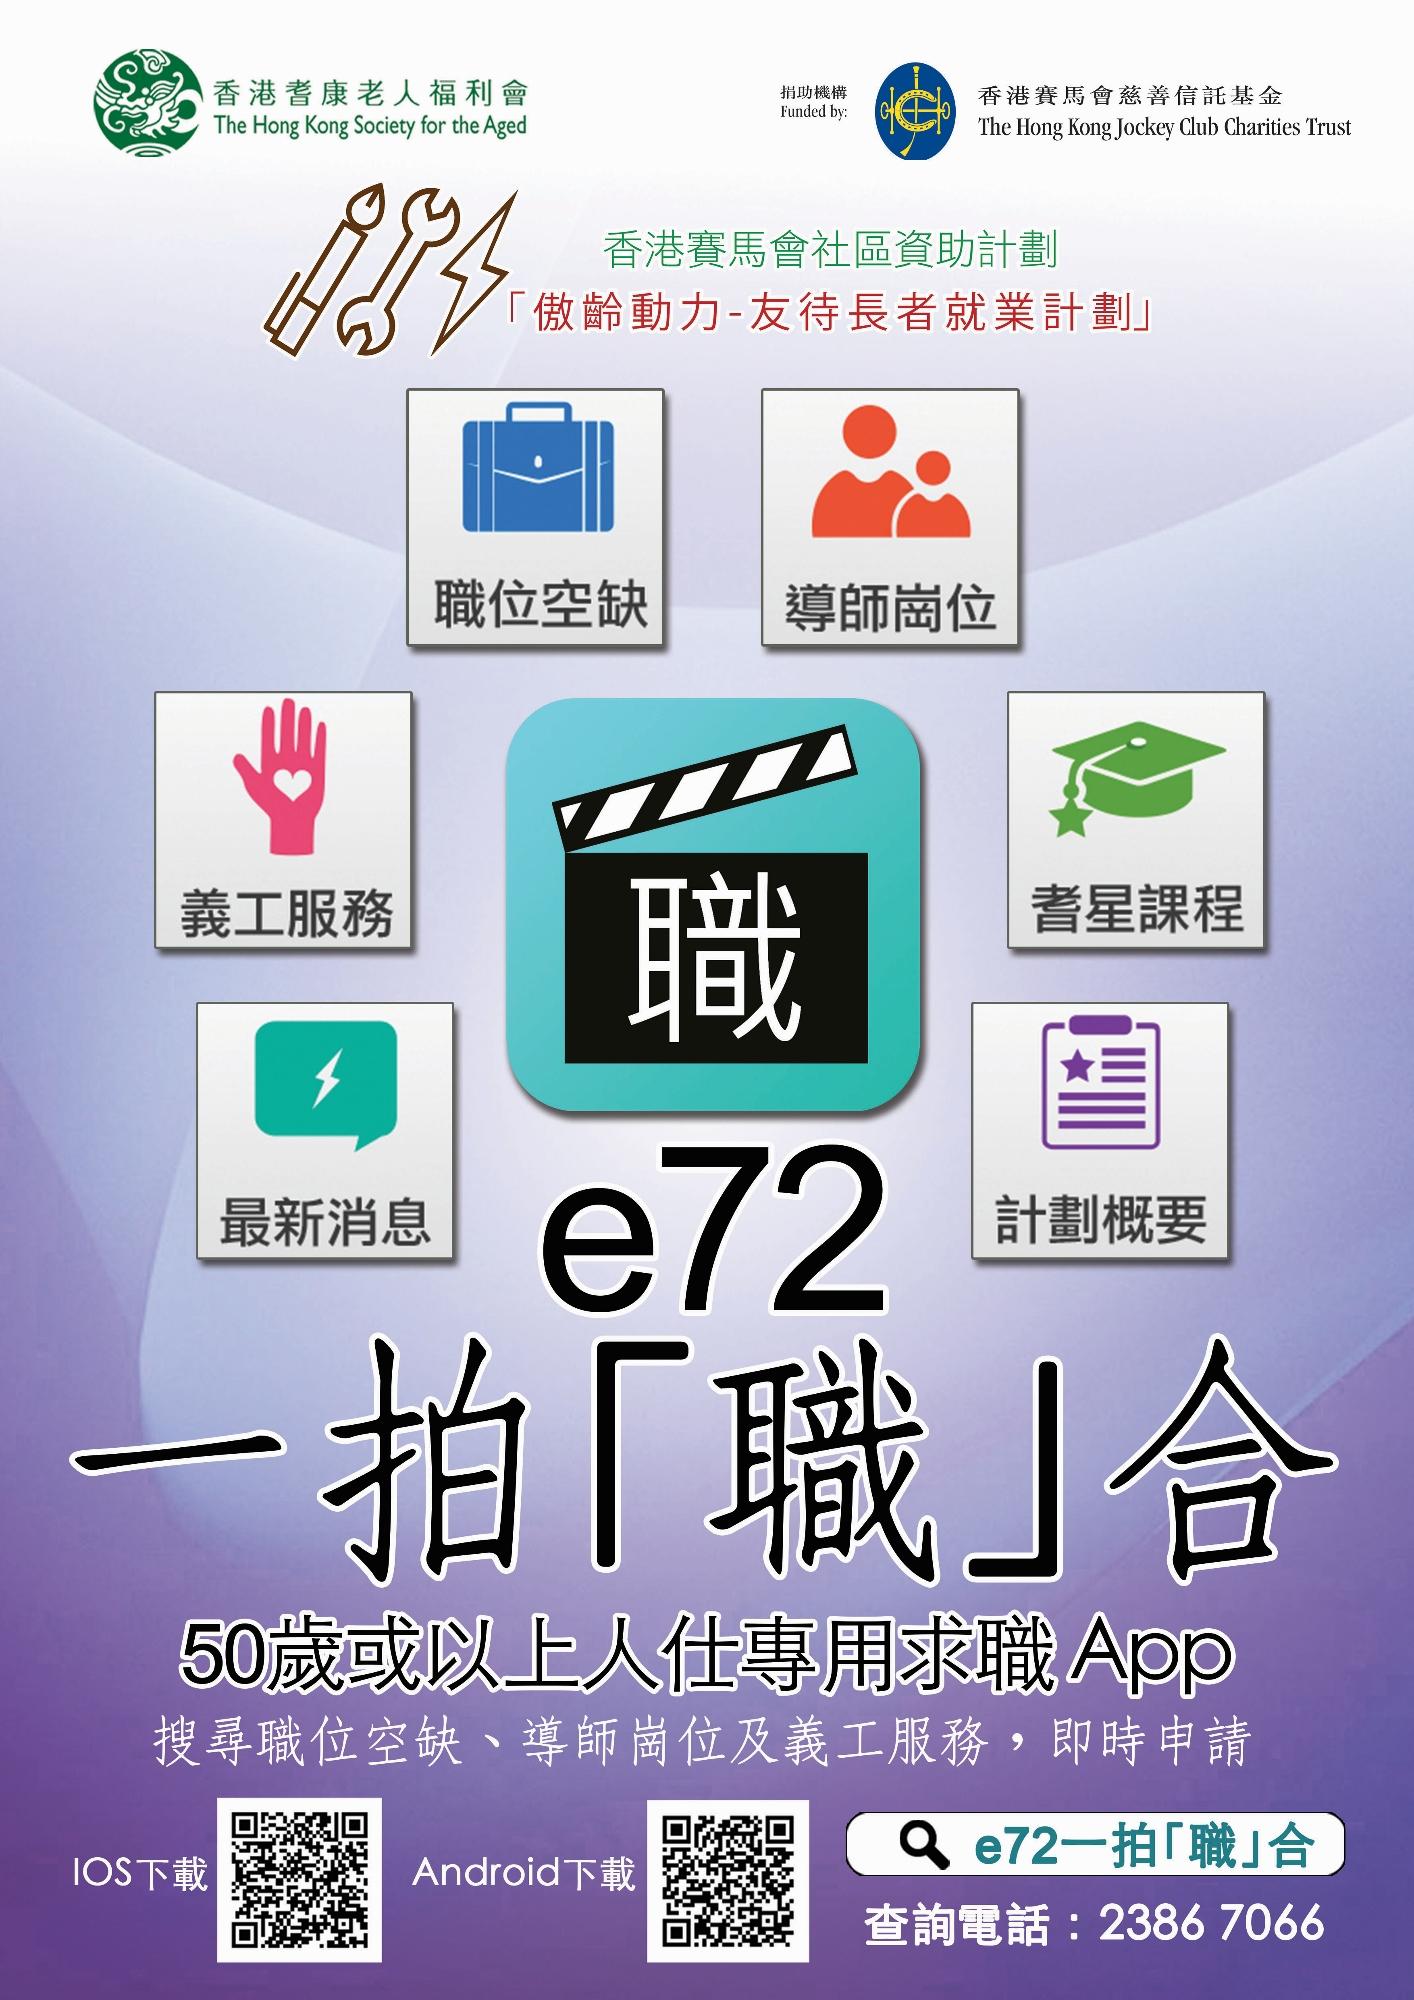 e72 一拍「職」合 - 中高齡人士的求職App